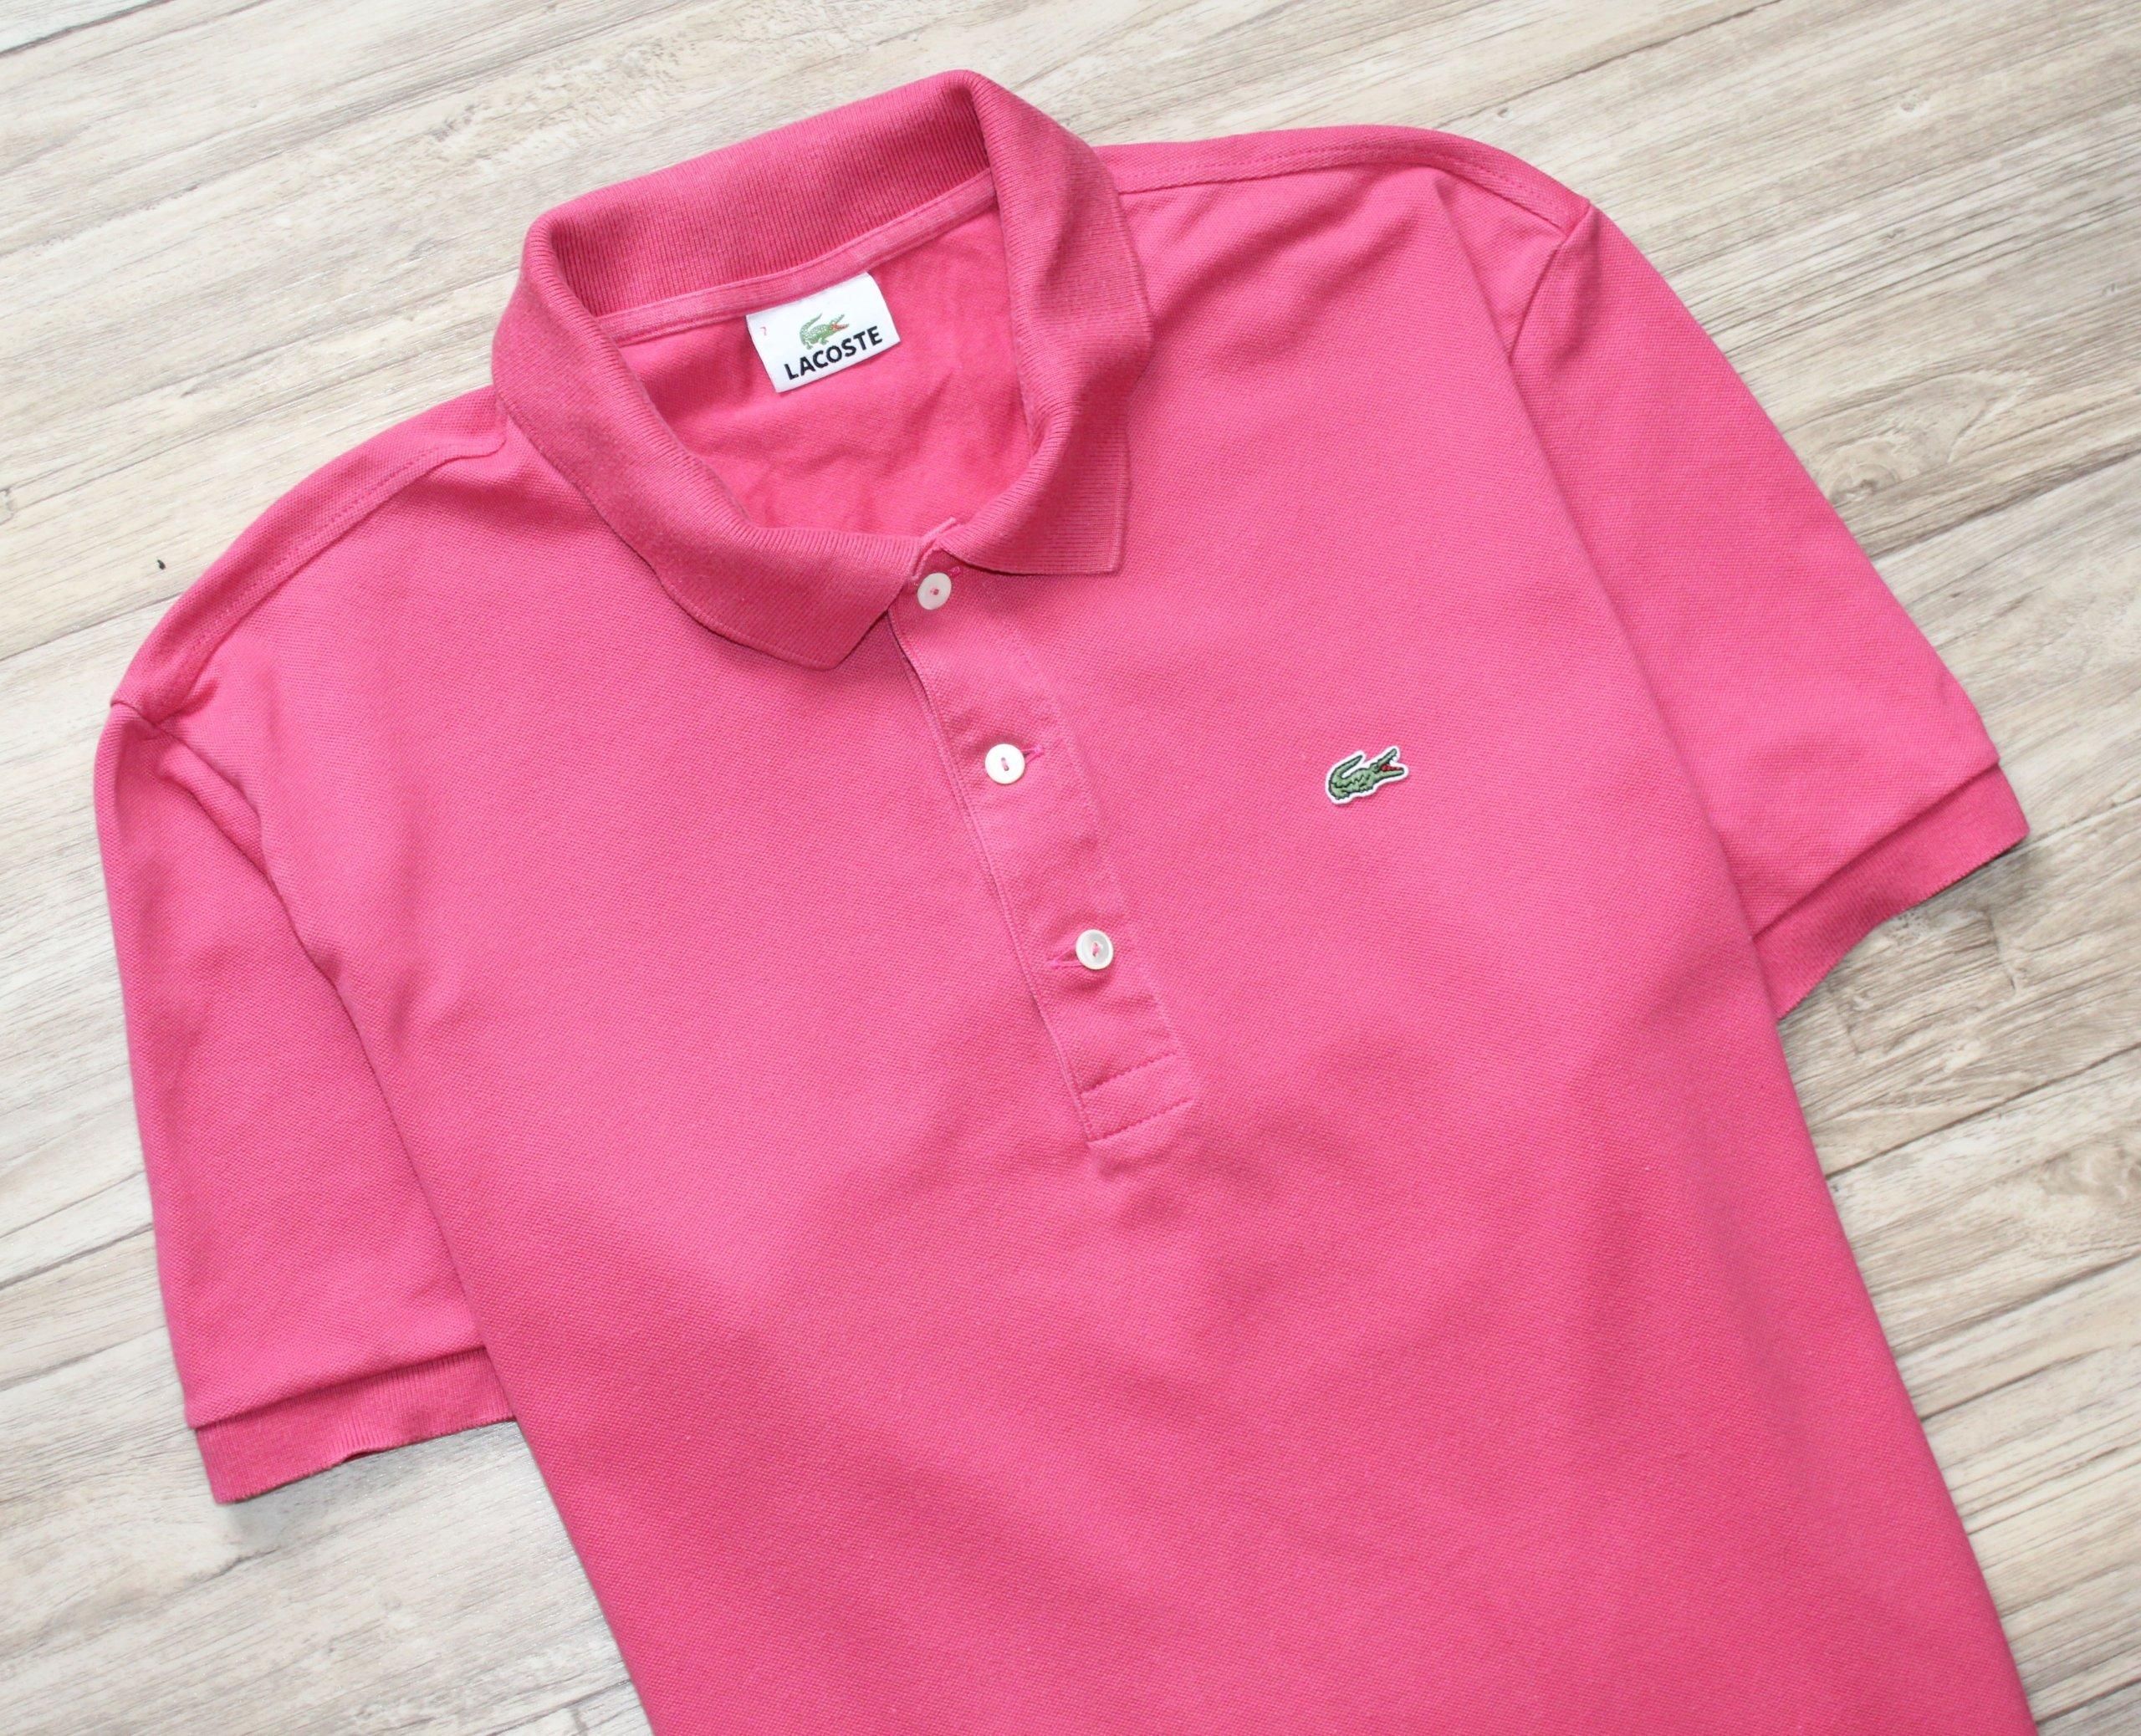 0aa7128a7 Bluzka t-shirt polo LACOSTE bdb L XL 7 - 7221284611 - oficjalne ...